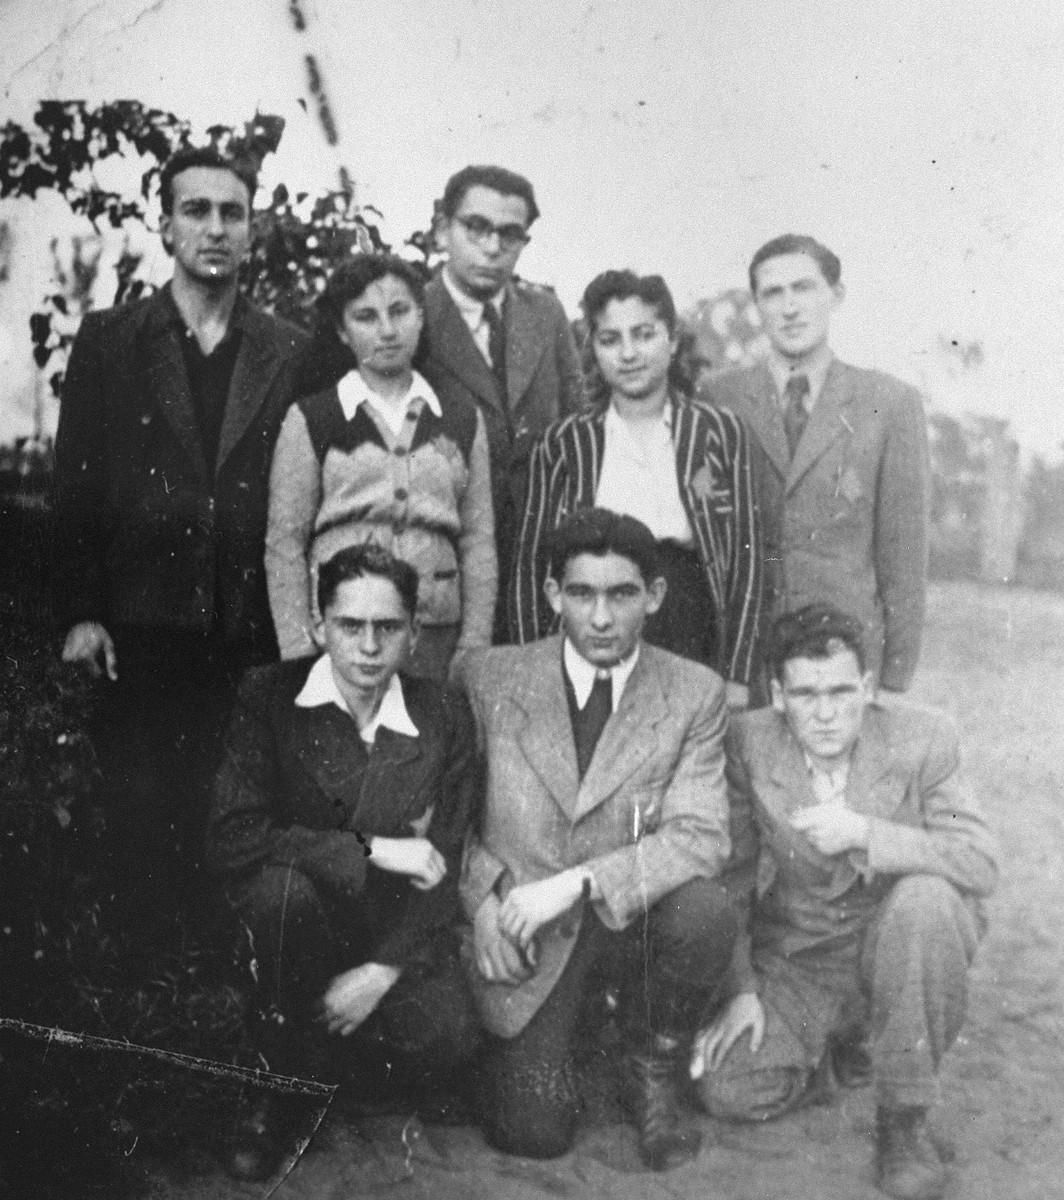 Members of the Irgun Brit Zion Zionist youth movement in the Kovno ghetto.  Standing from left to right are:  Elijahu Kelson; Rivka Rogol; Zelimar Frankel (Shlomo Shafir); Sara Starovolsky; Zerubavel Rosenzweig. Kneeling from left to right:  Moshe Gurewitz, Mordechai Fisher; Chaim Stropp.